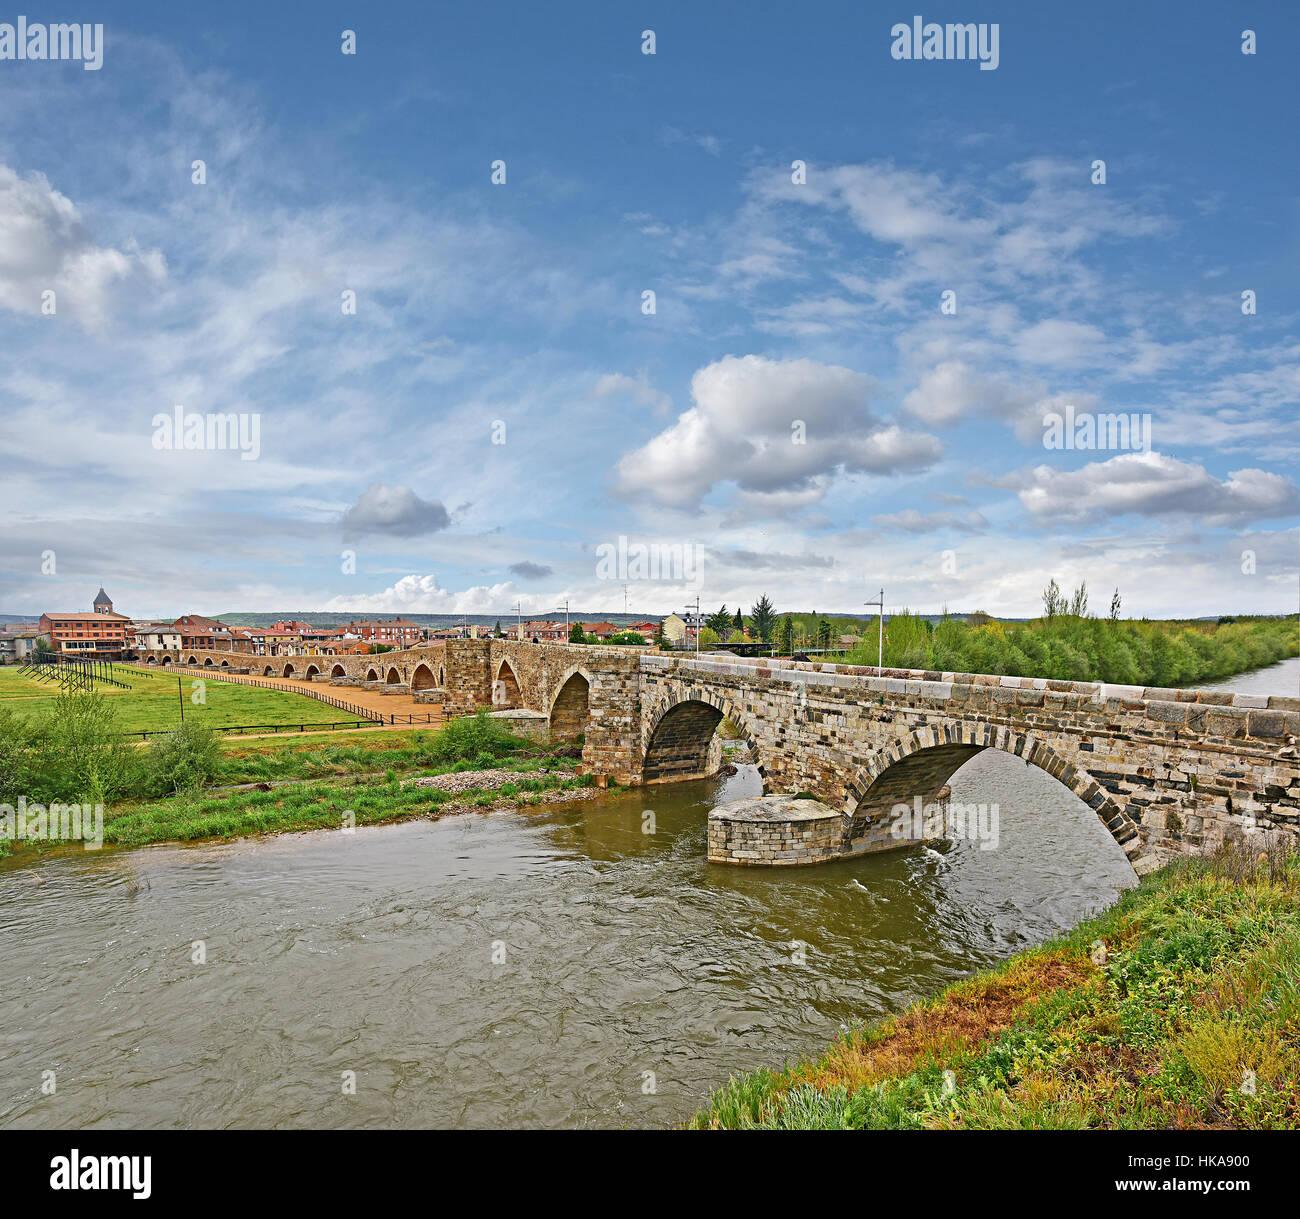 La Puente del Passo Honroso at Hospital de Órbigo - The Bridge of the Honorable Step on the Camino de Santiago - Stock Image